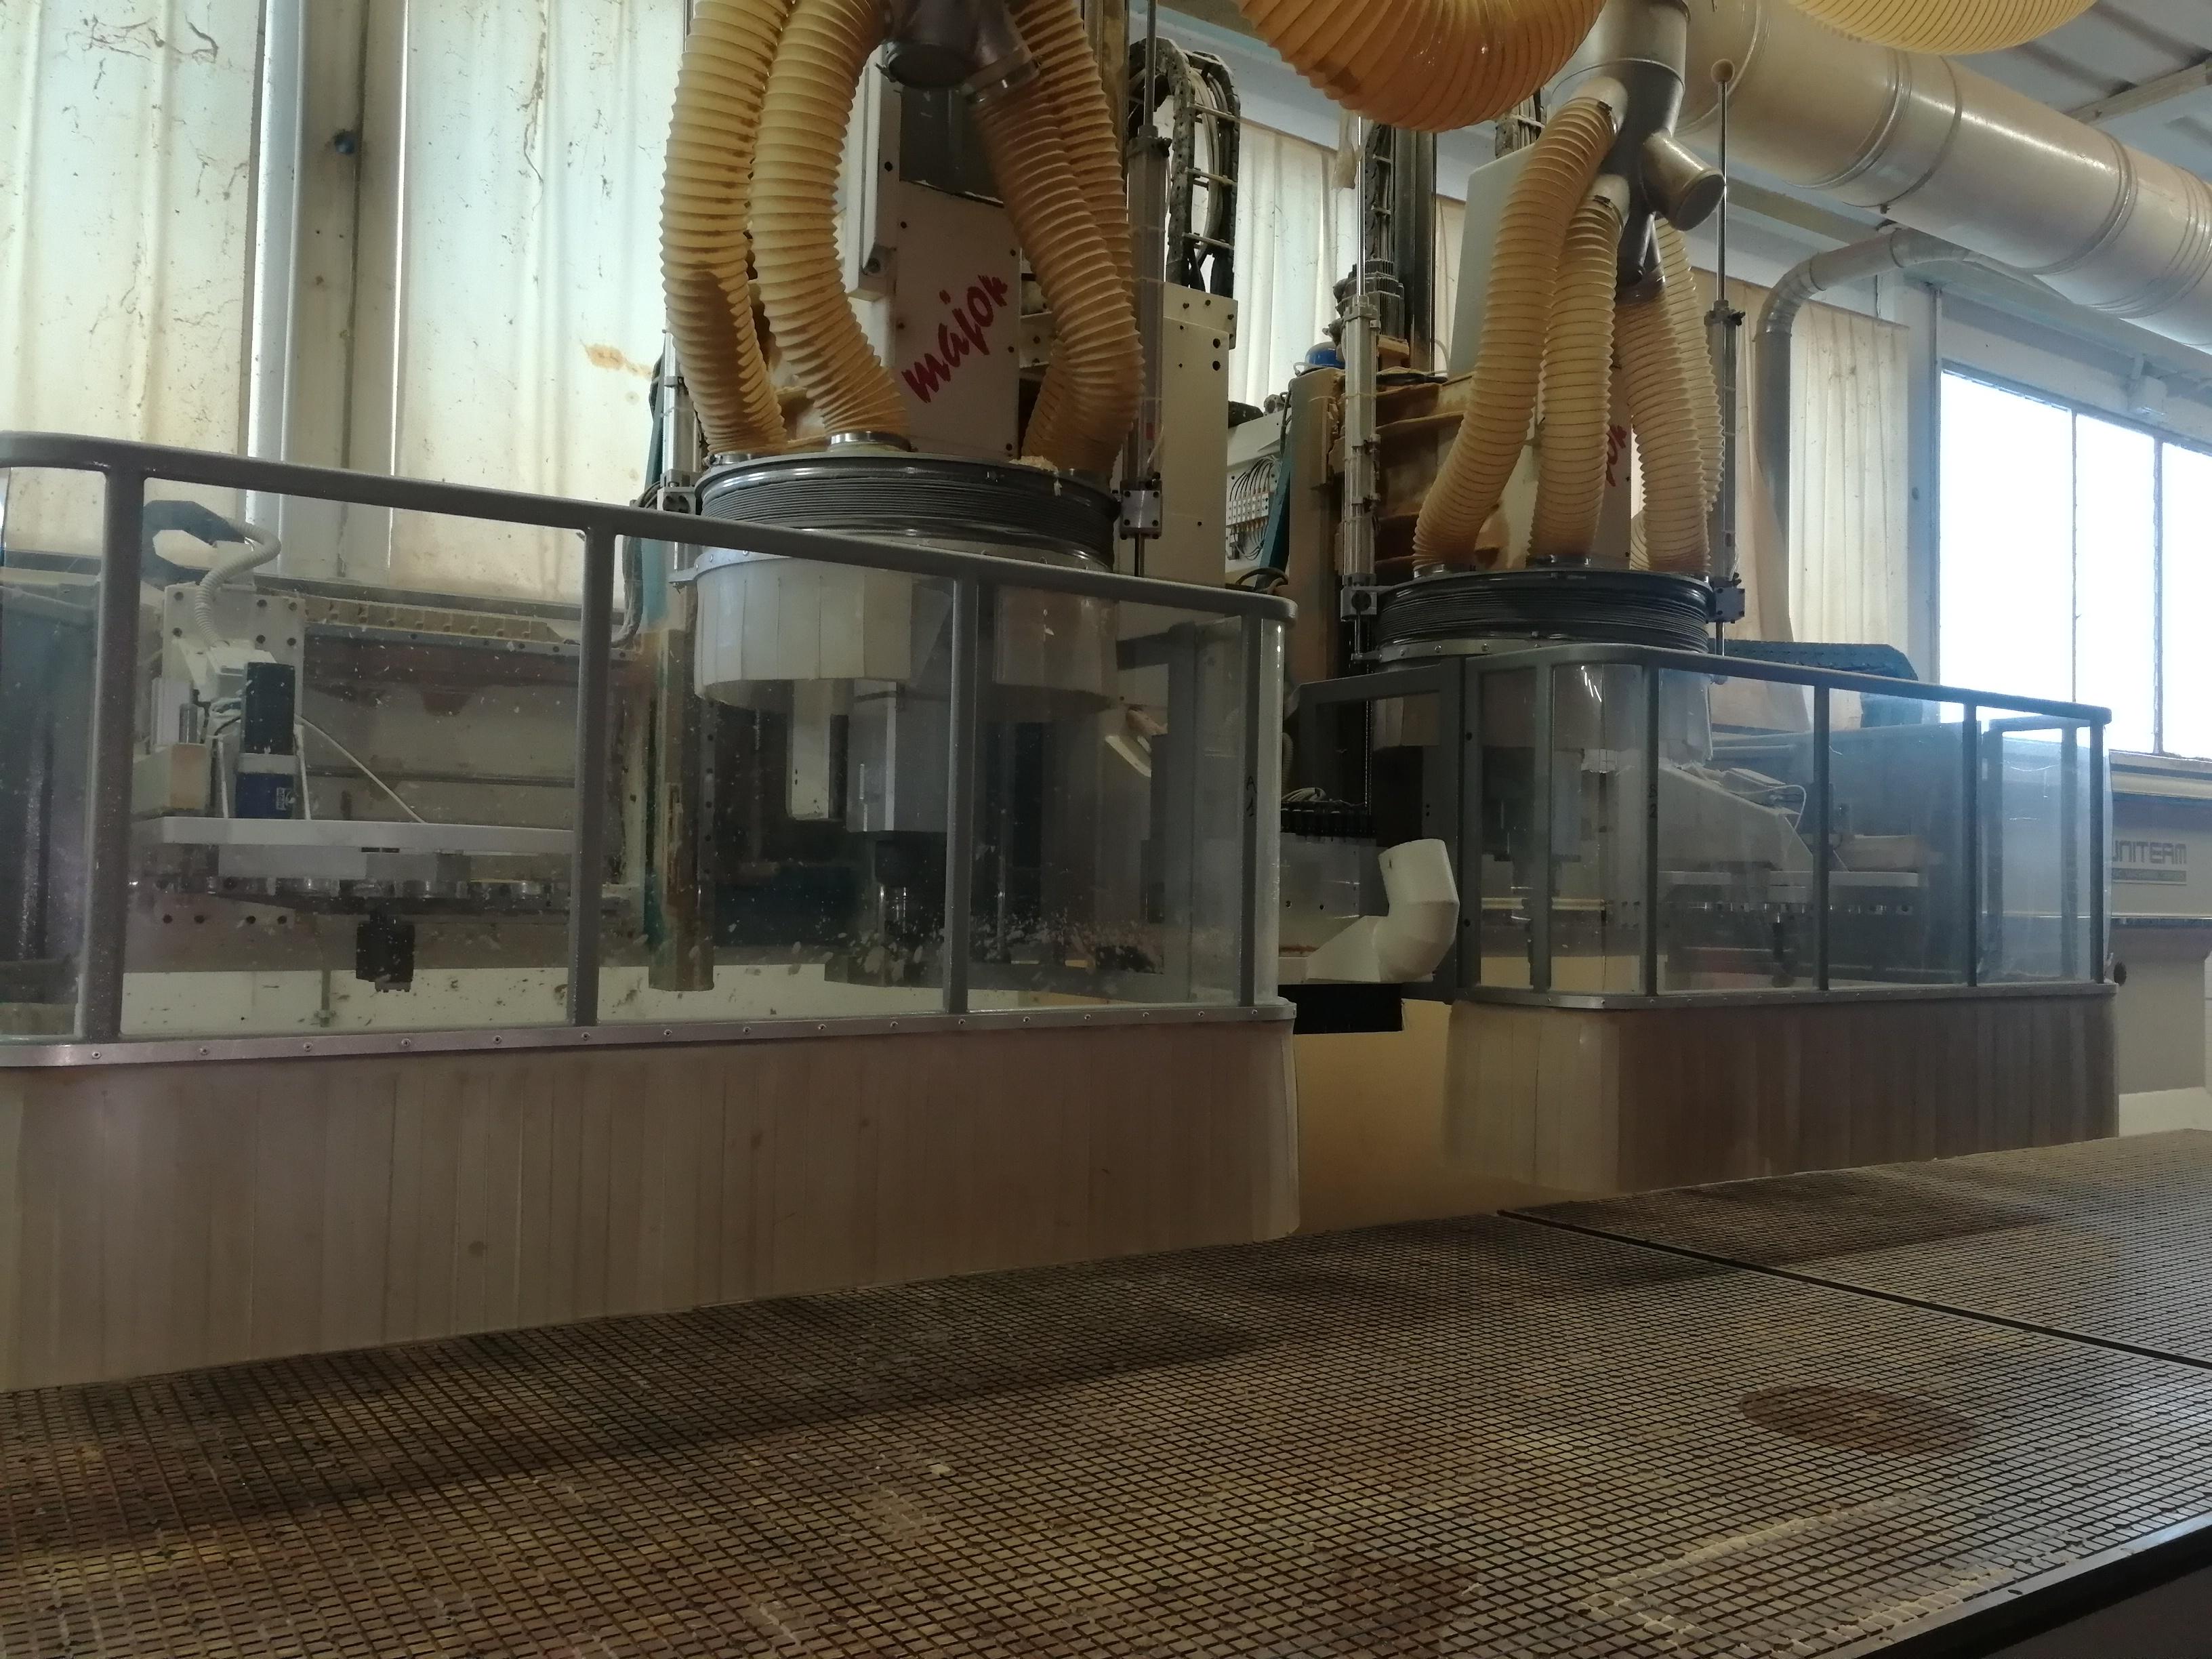 CNC DOPPIA TESTA 5 ASSI - UNITEAM MAJOR 2R/6016-430 in vendita - foto 6